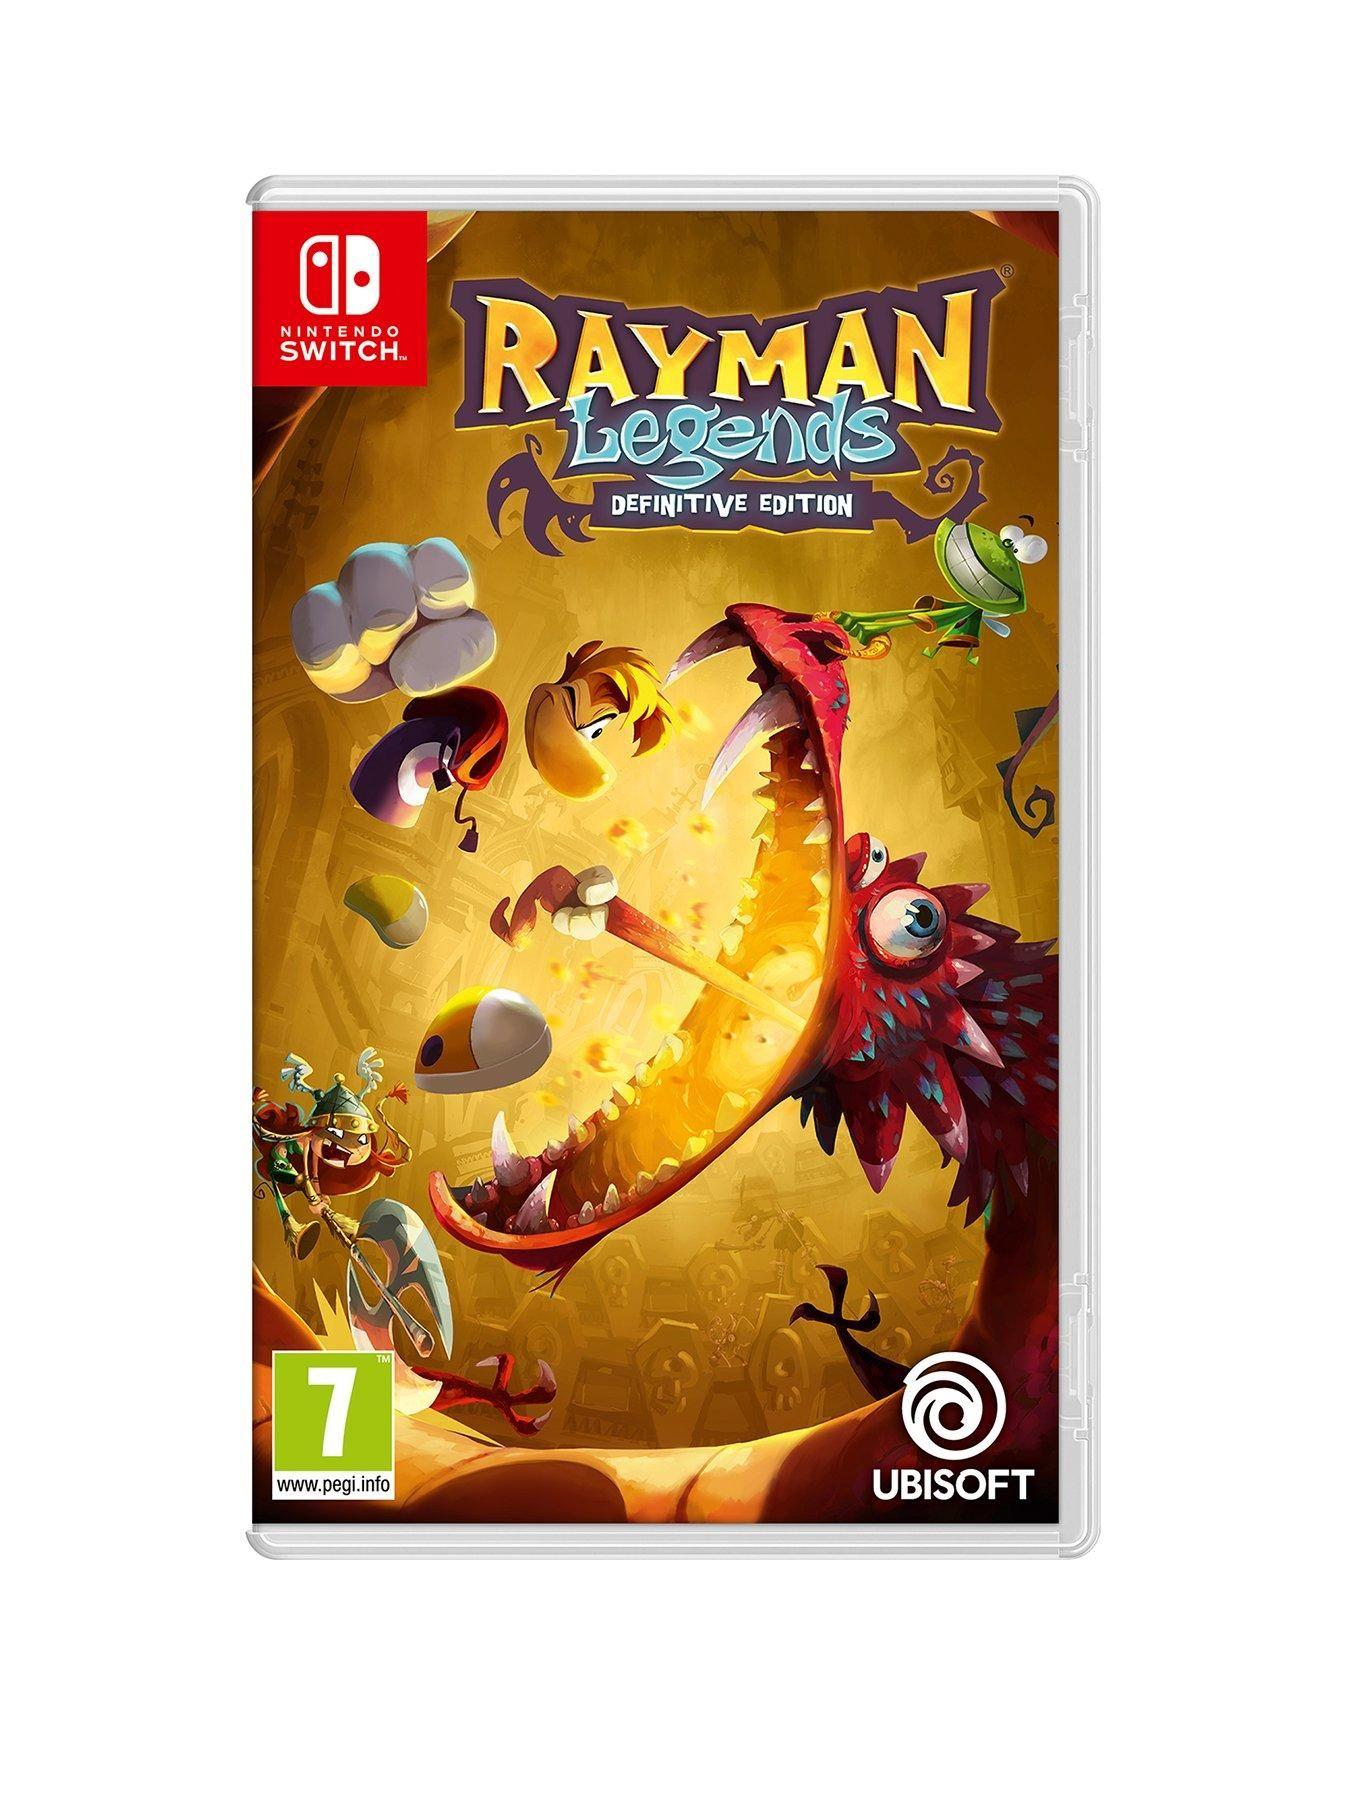 Rayman Legends Definitive Edition Rayman legends